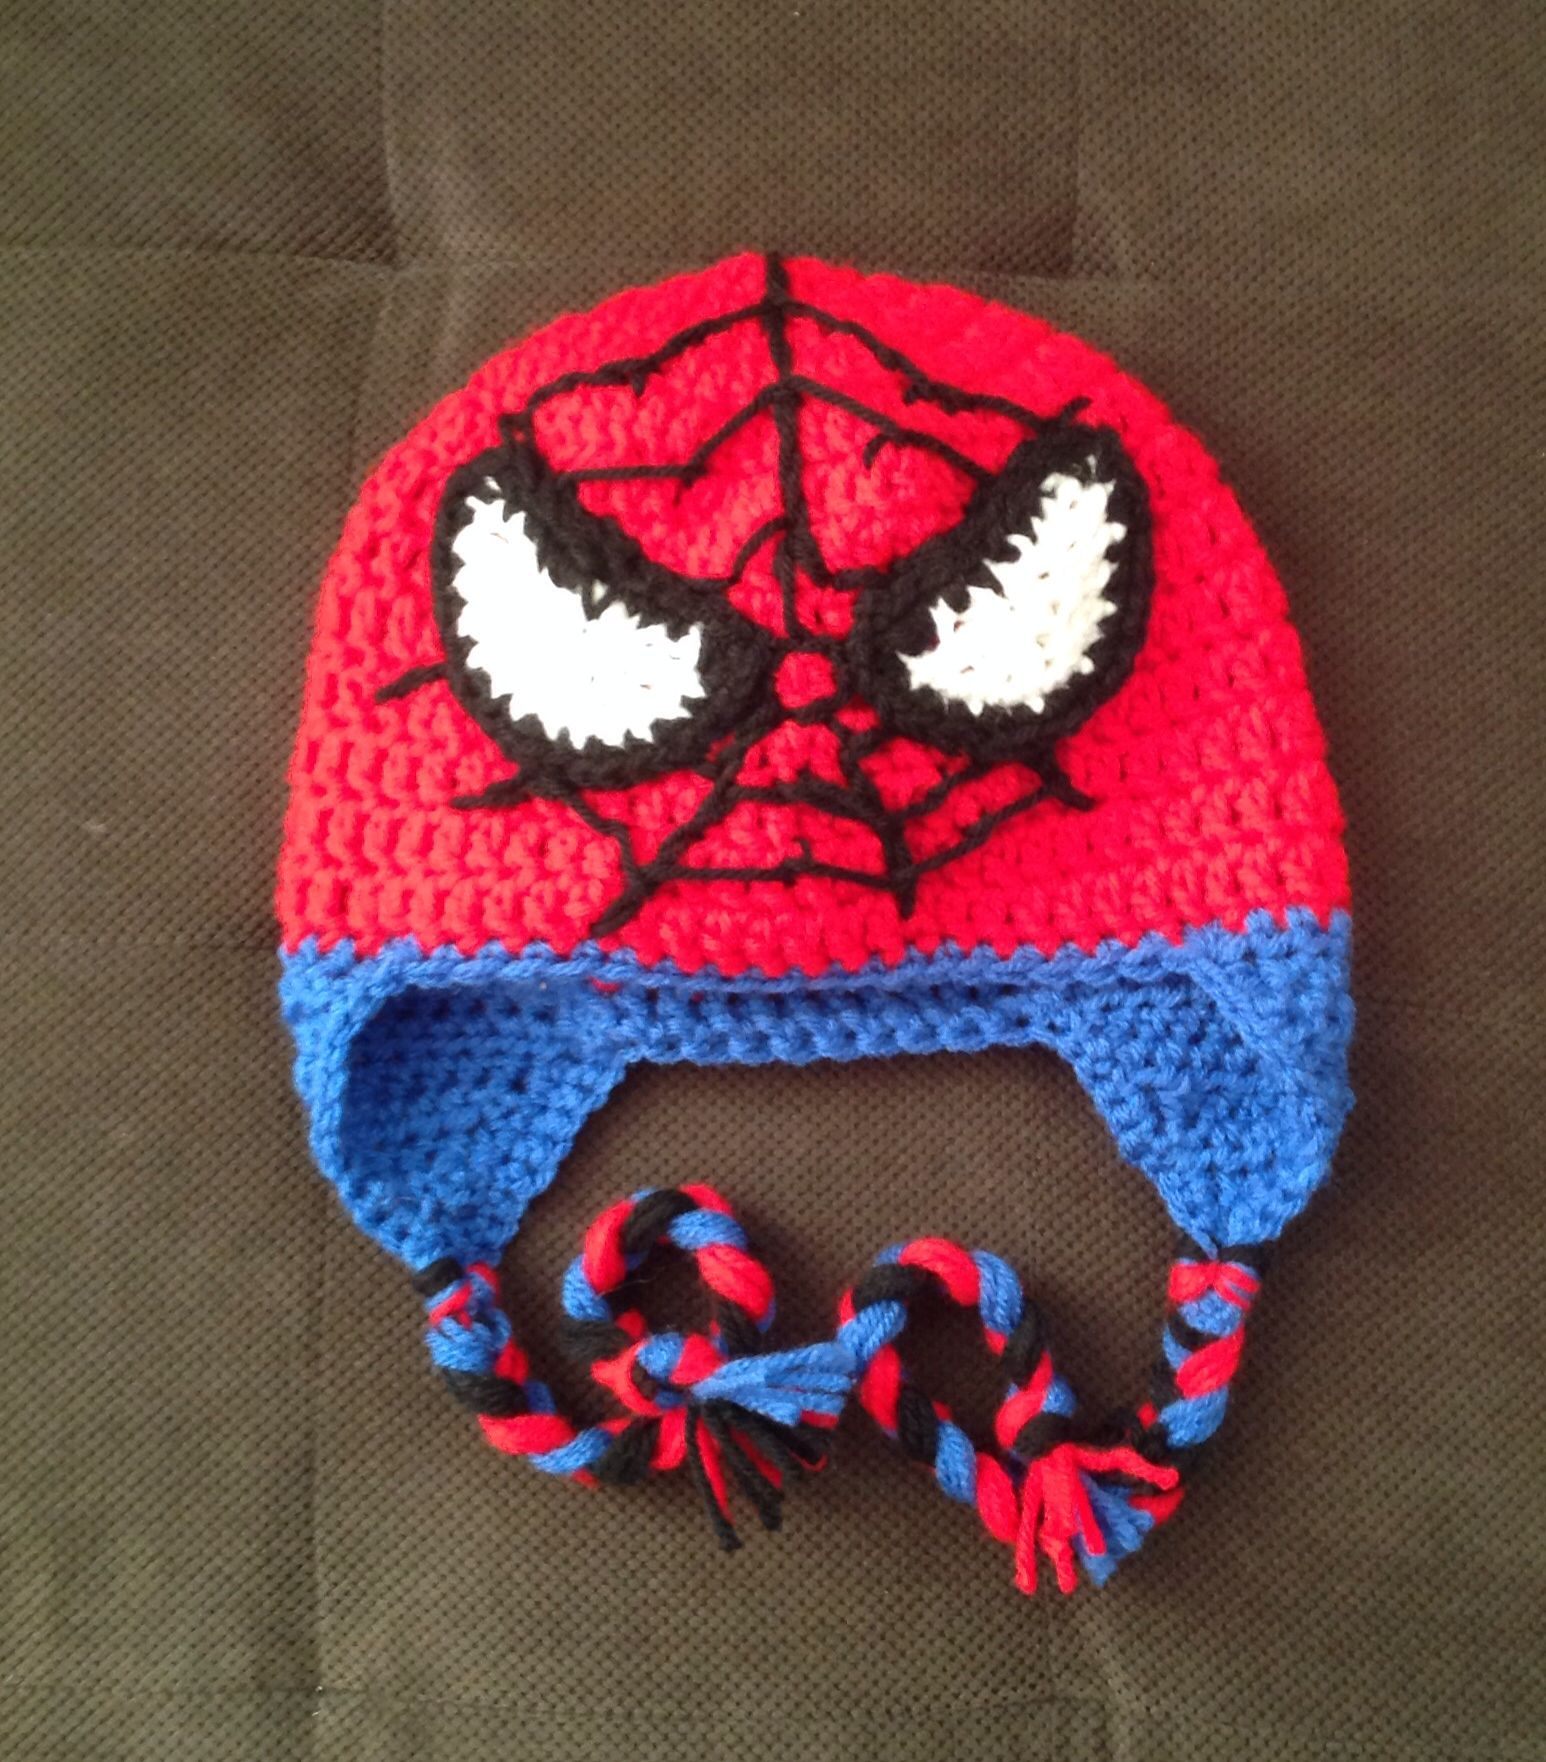 ... hat crochet patterns pinterest crochet pattern for spider man hat